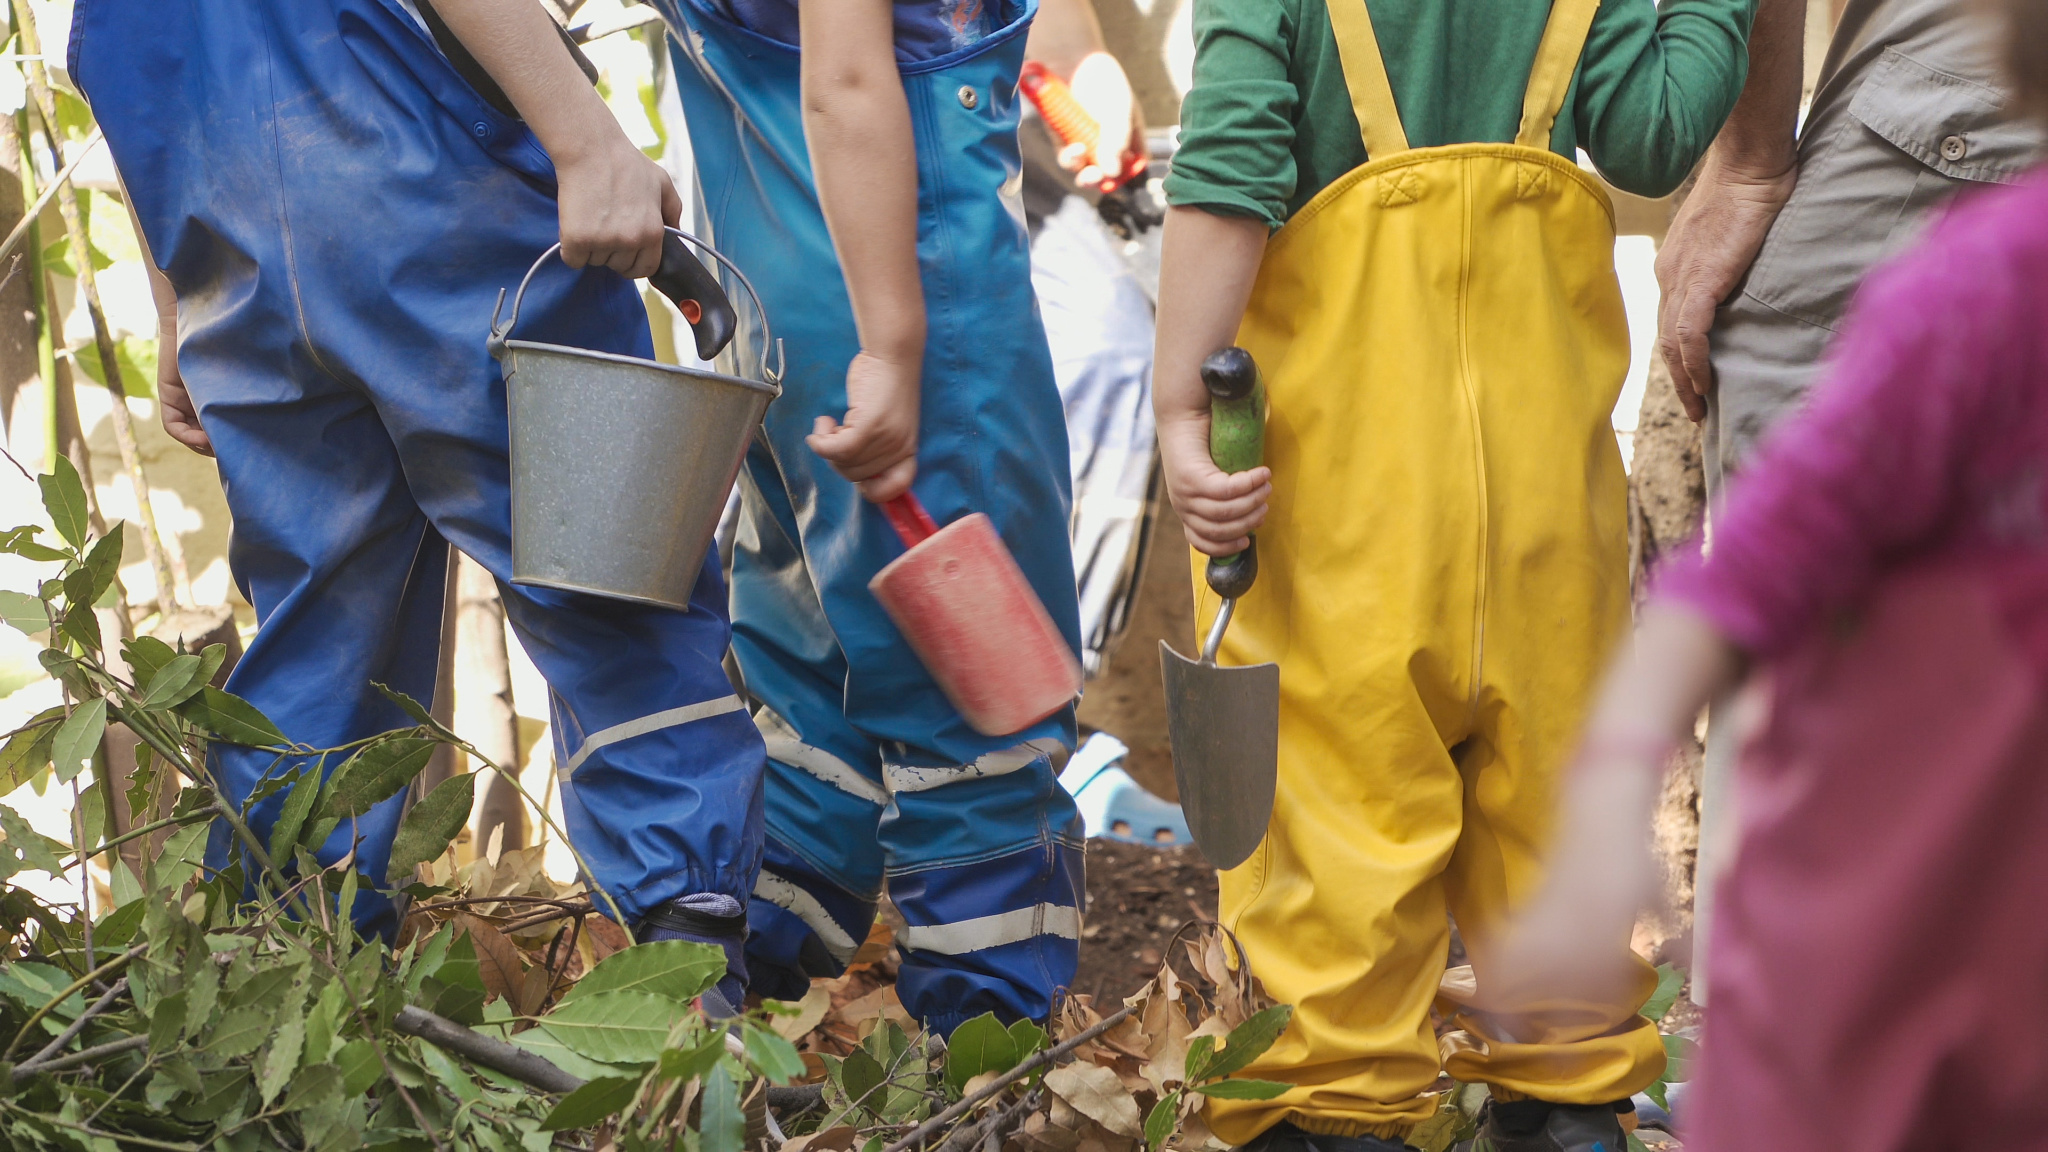 Karydia Kindergarden children with shovels